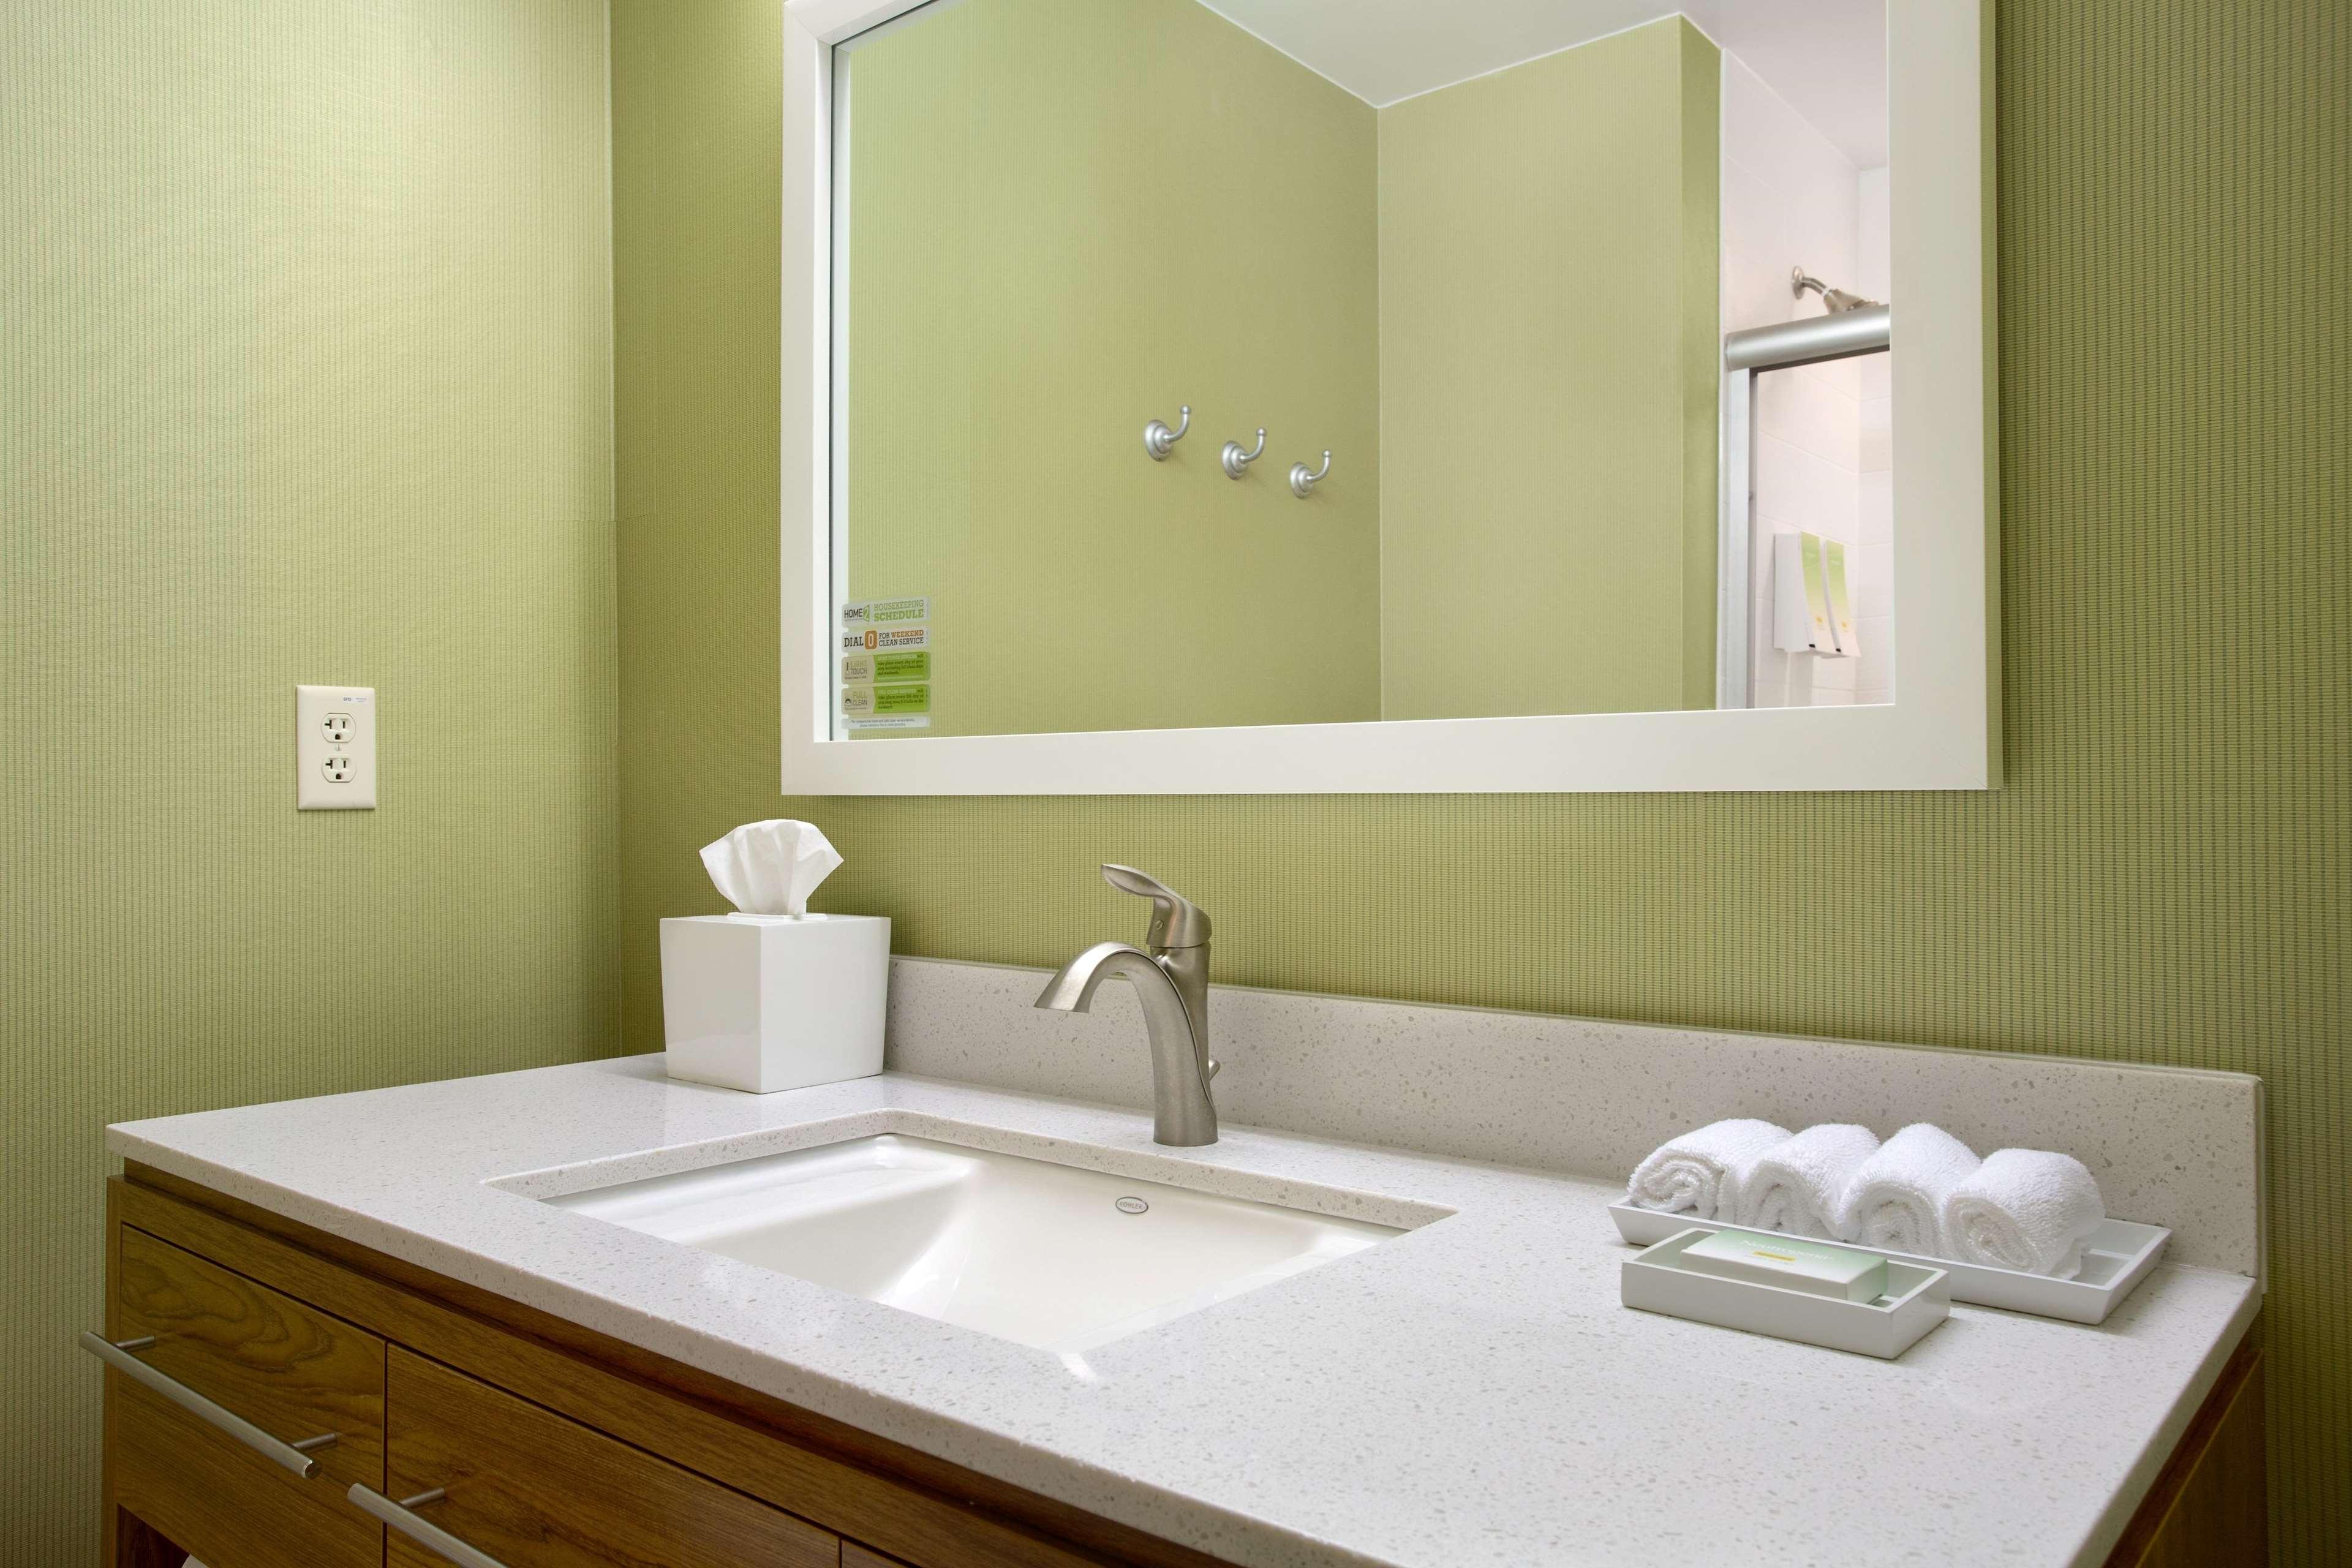 Home2 Suites by Hilton San Antonio Airport, TX image 15